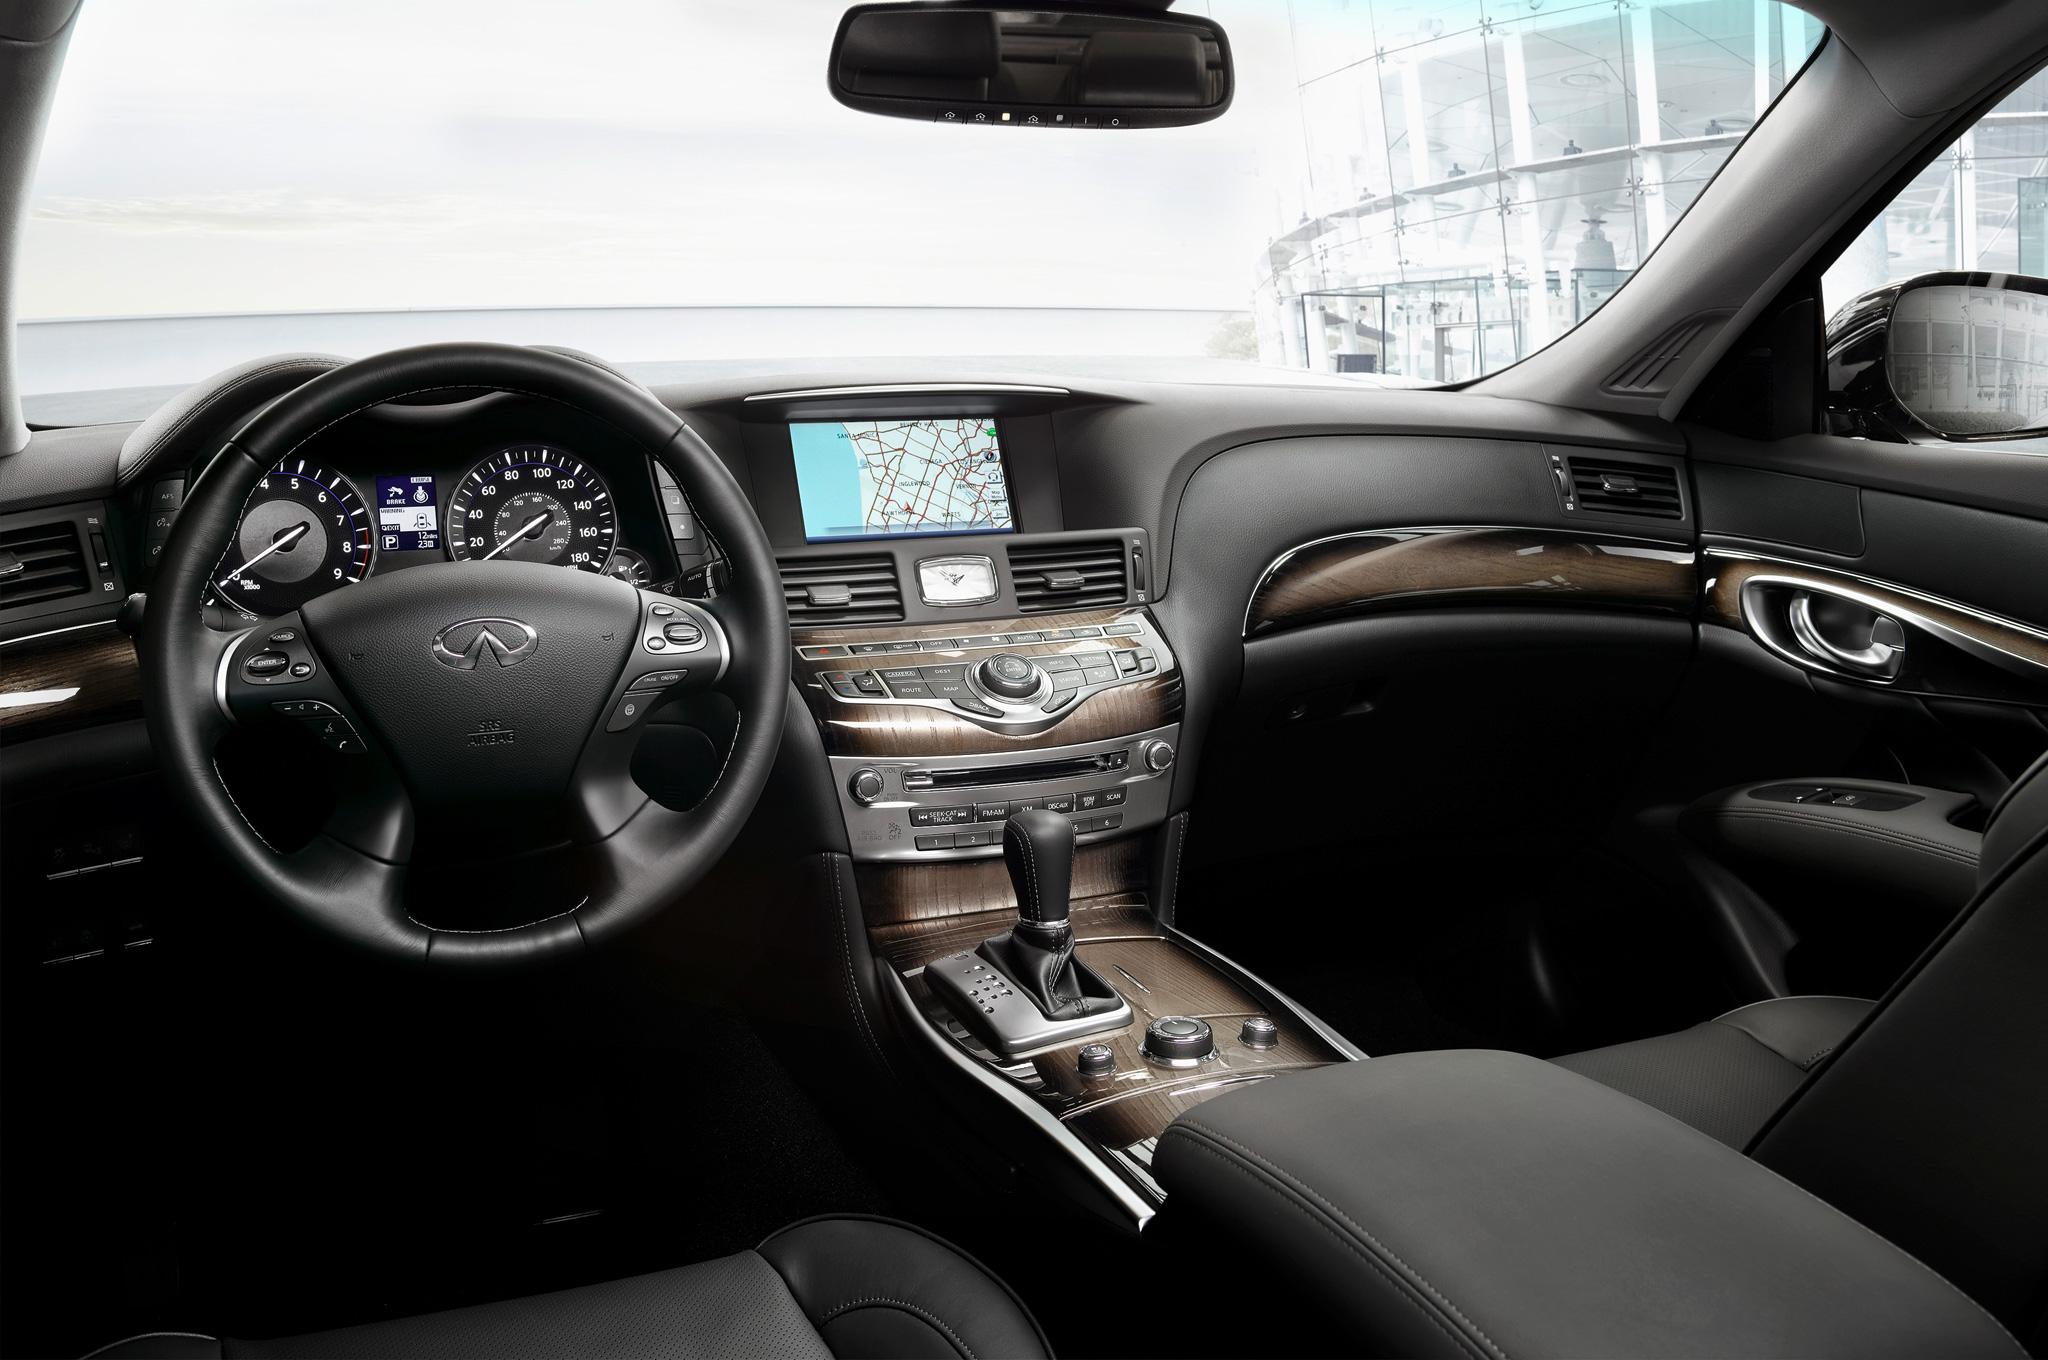 2015 Infiniti Q70l Cockpit And Head Unit (View 6 of 10)